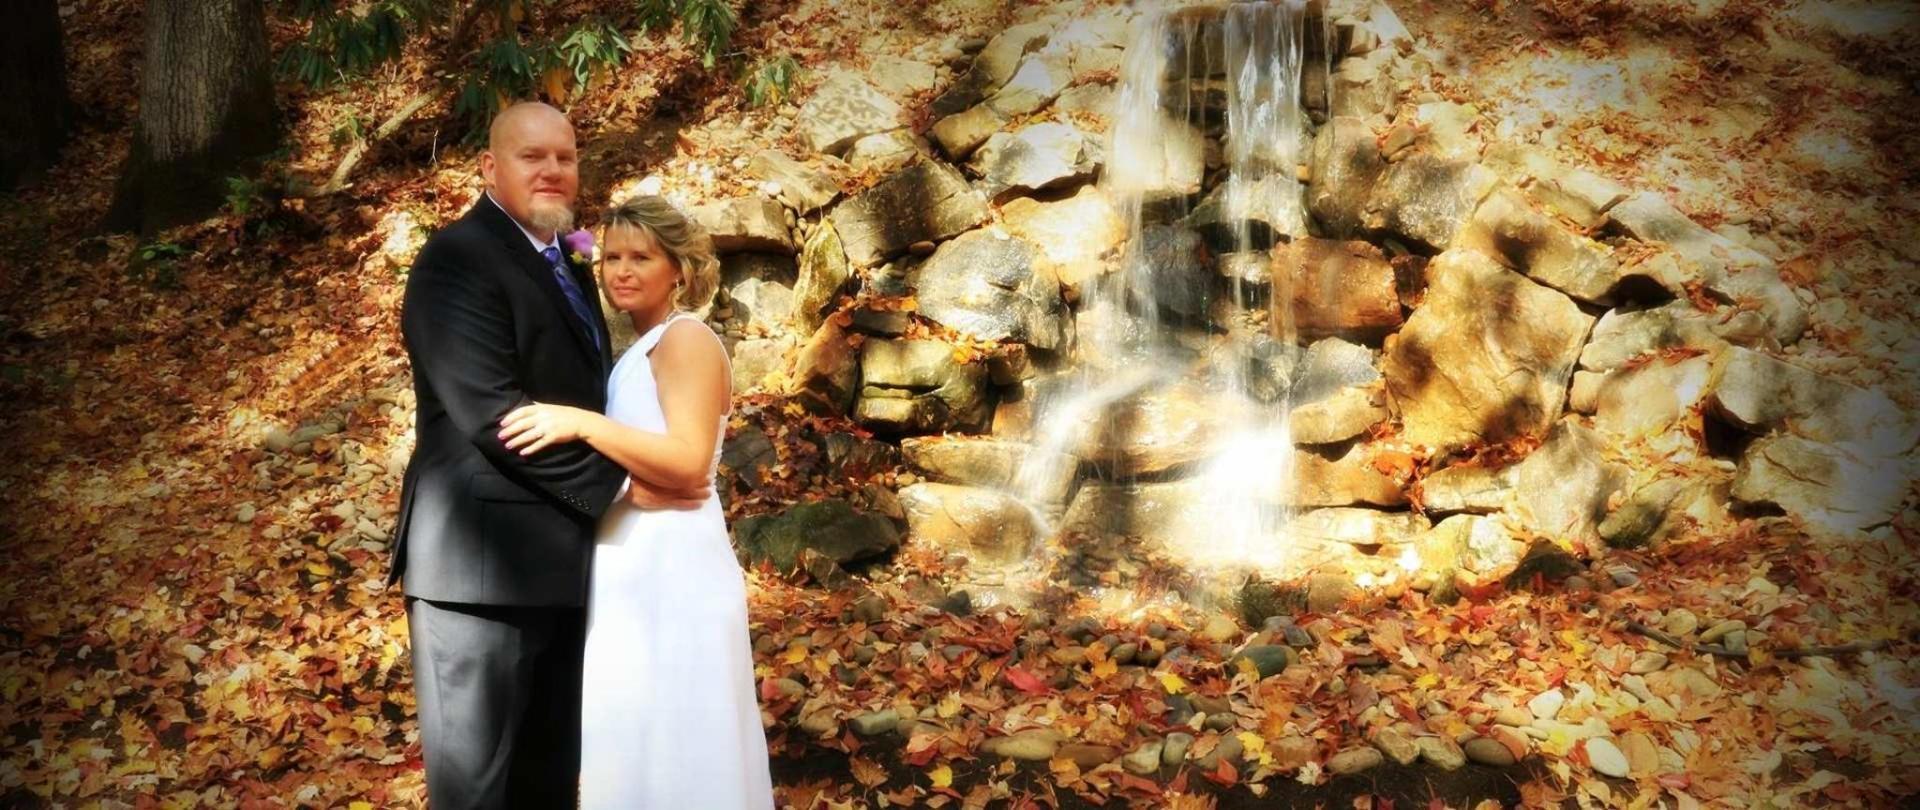 cupid-s-waterfall-04.jpg.1920x810_0_163_10000.jpeg.1920x0.jpeg